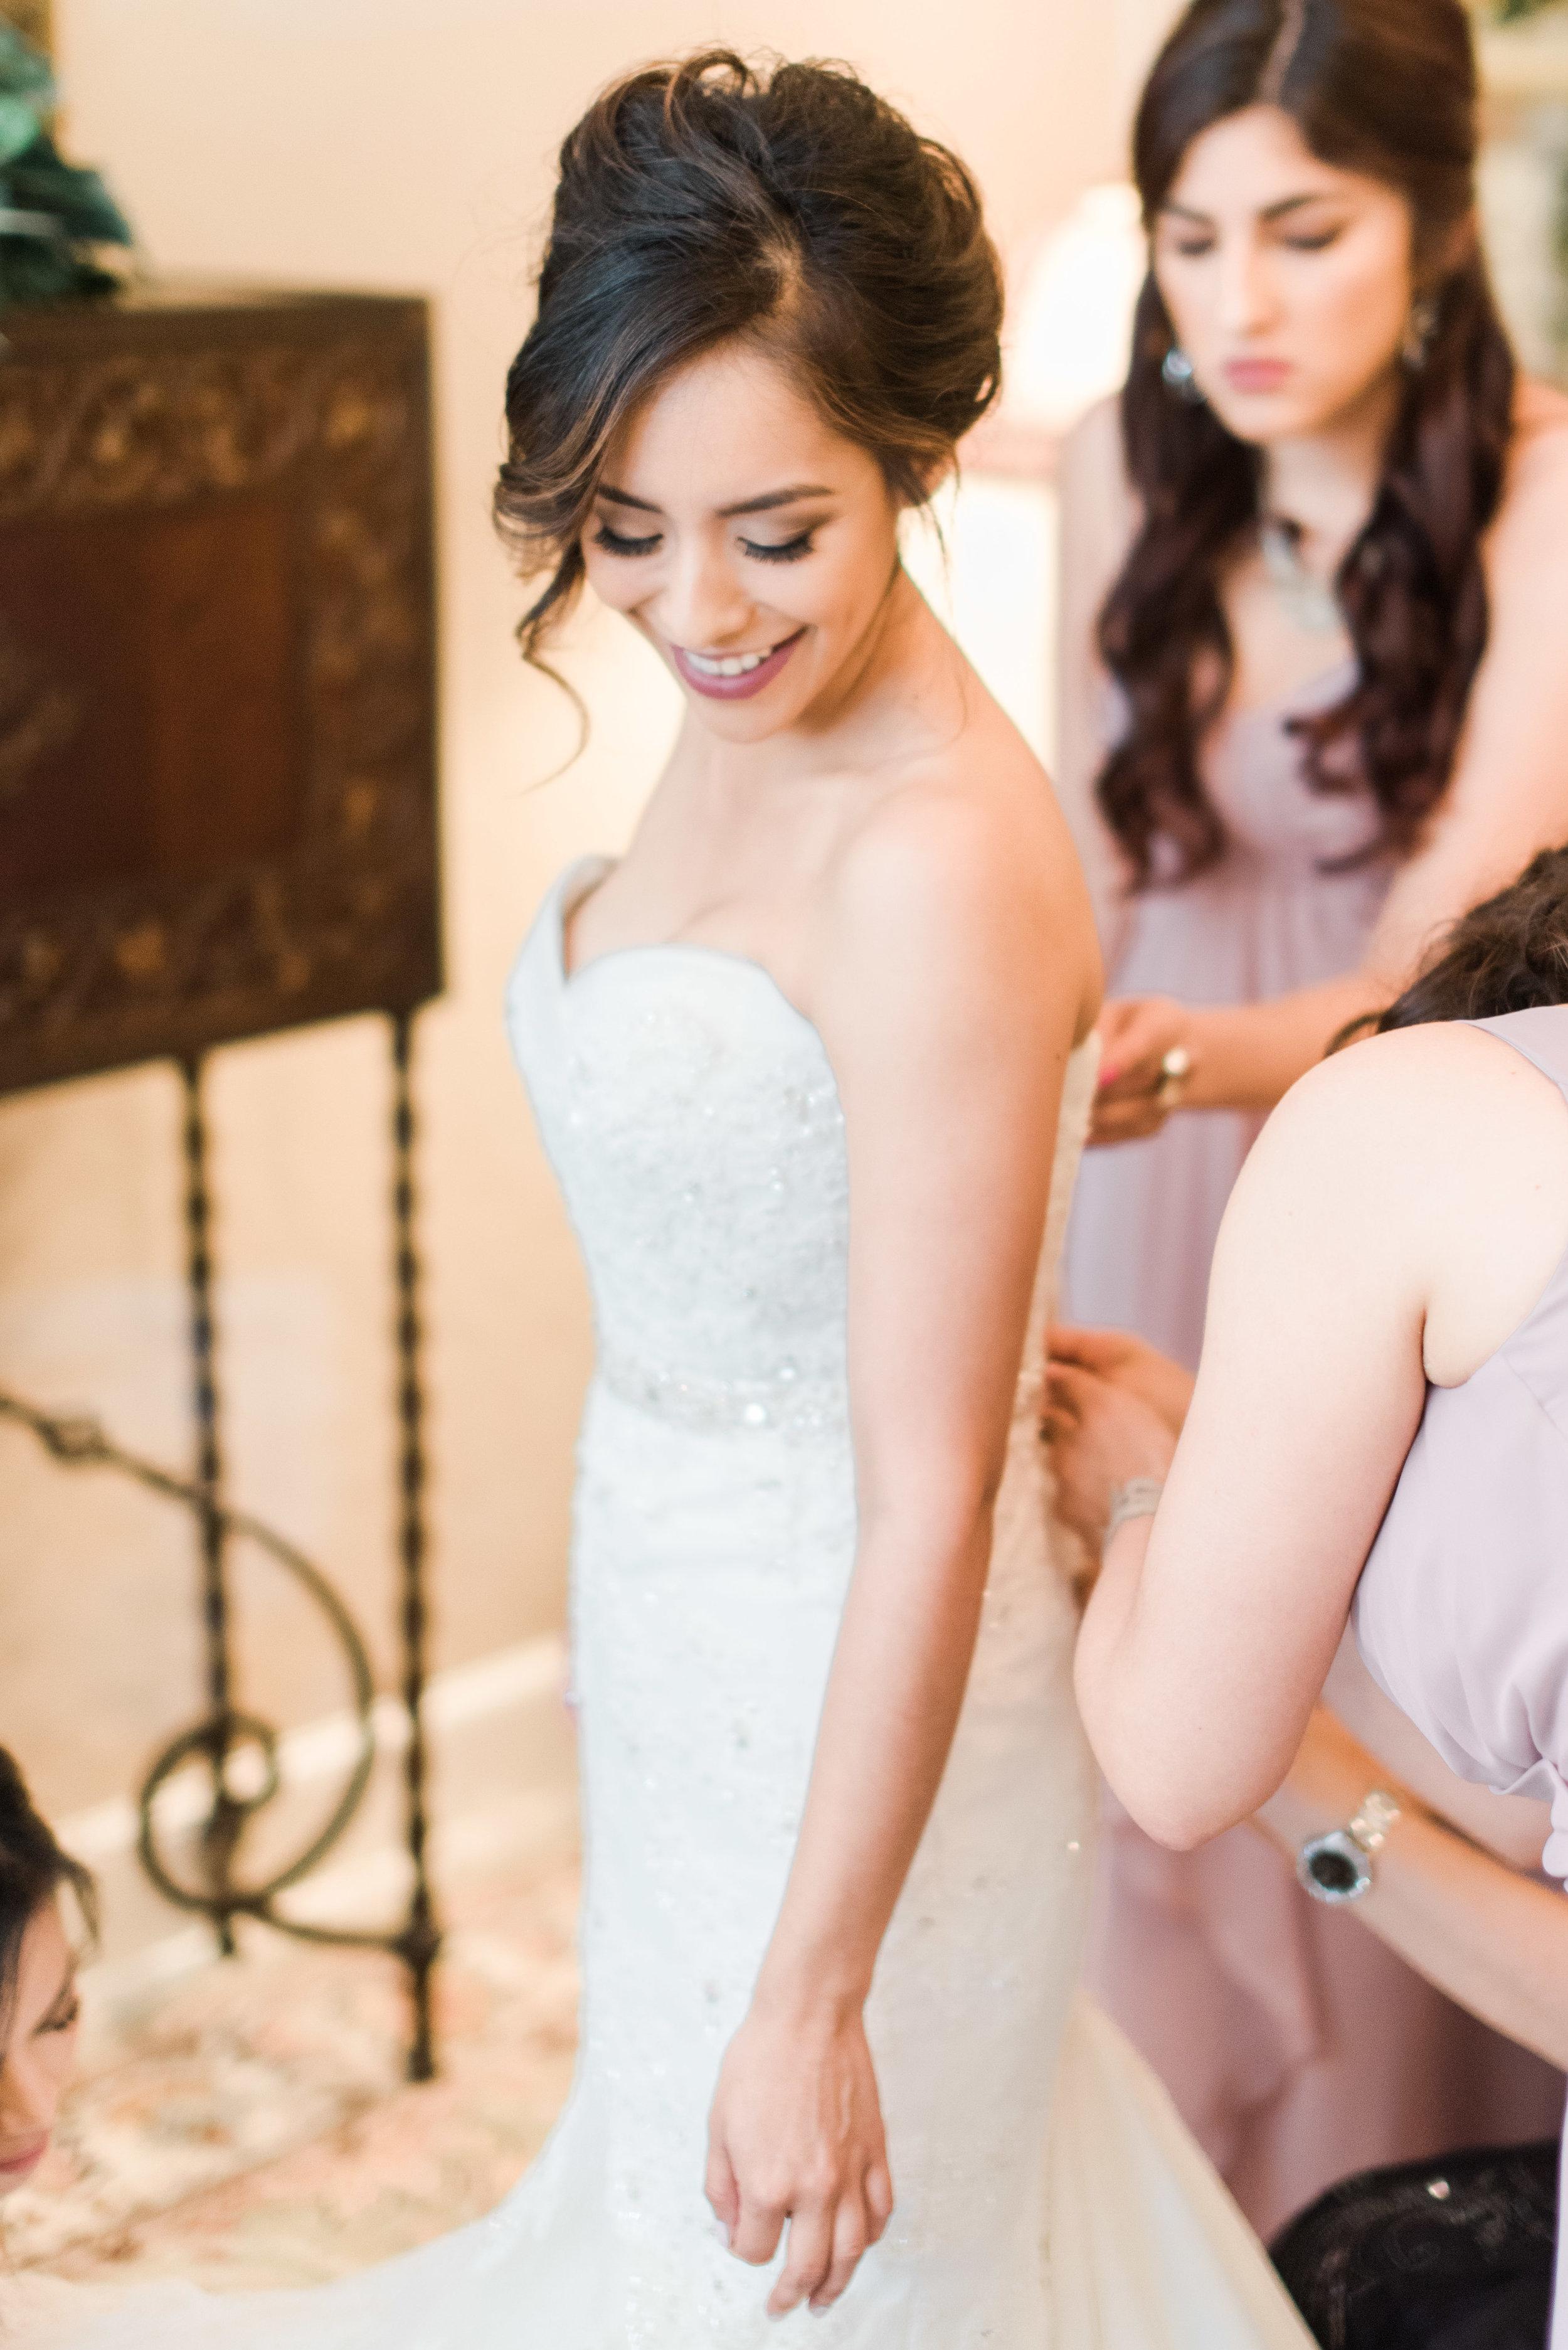 Houston-Wedding-Photography-St.-Anne-Catholic-Church-Houston-Wedding-The-Bell-Tower-on-34th-reception-wedding-film-3.jpg